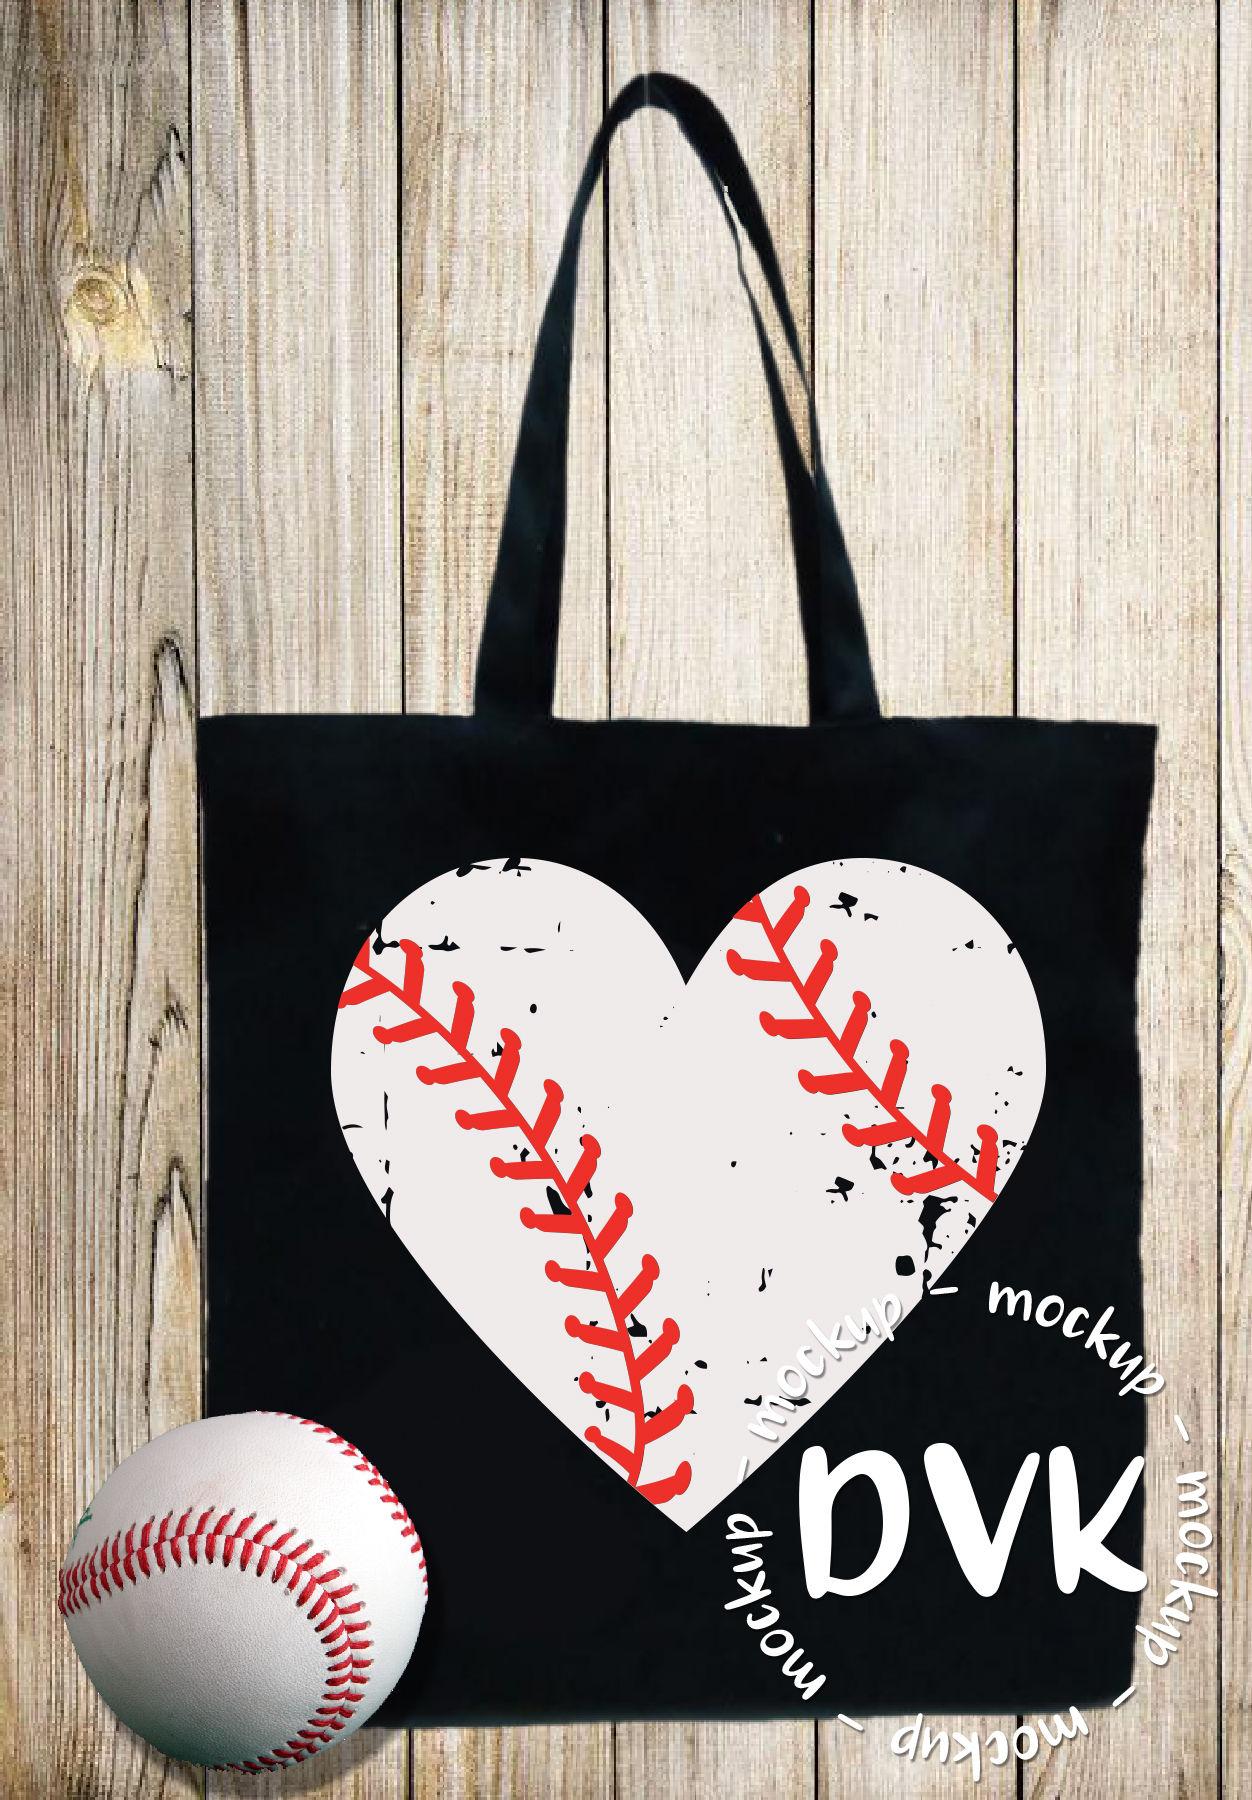 Baseball Svg Baseball Heart Love Baseball Grunge Svg Dxf Cut File By Designs By Victoria K Thehungryjpeg Com